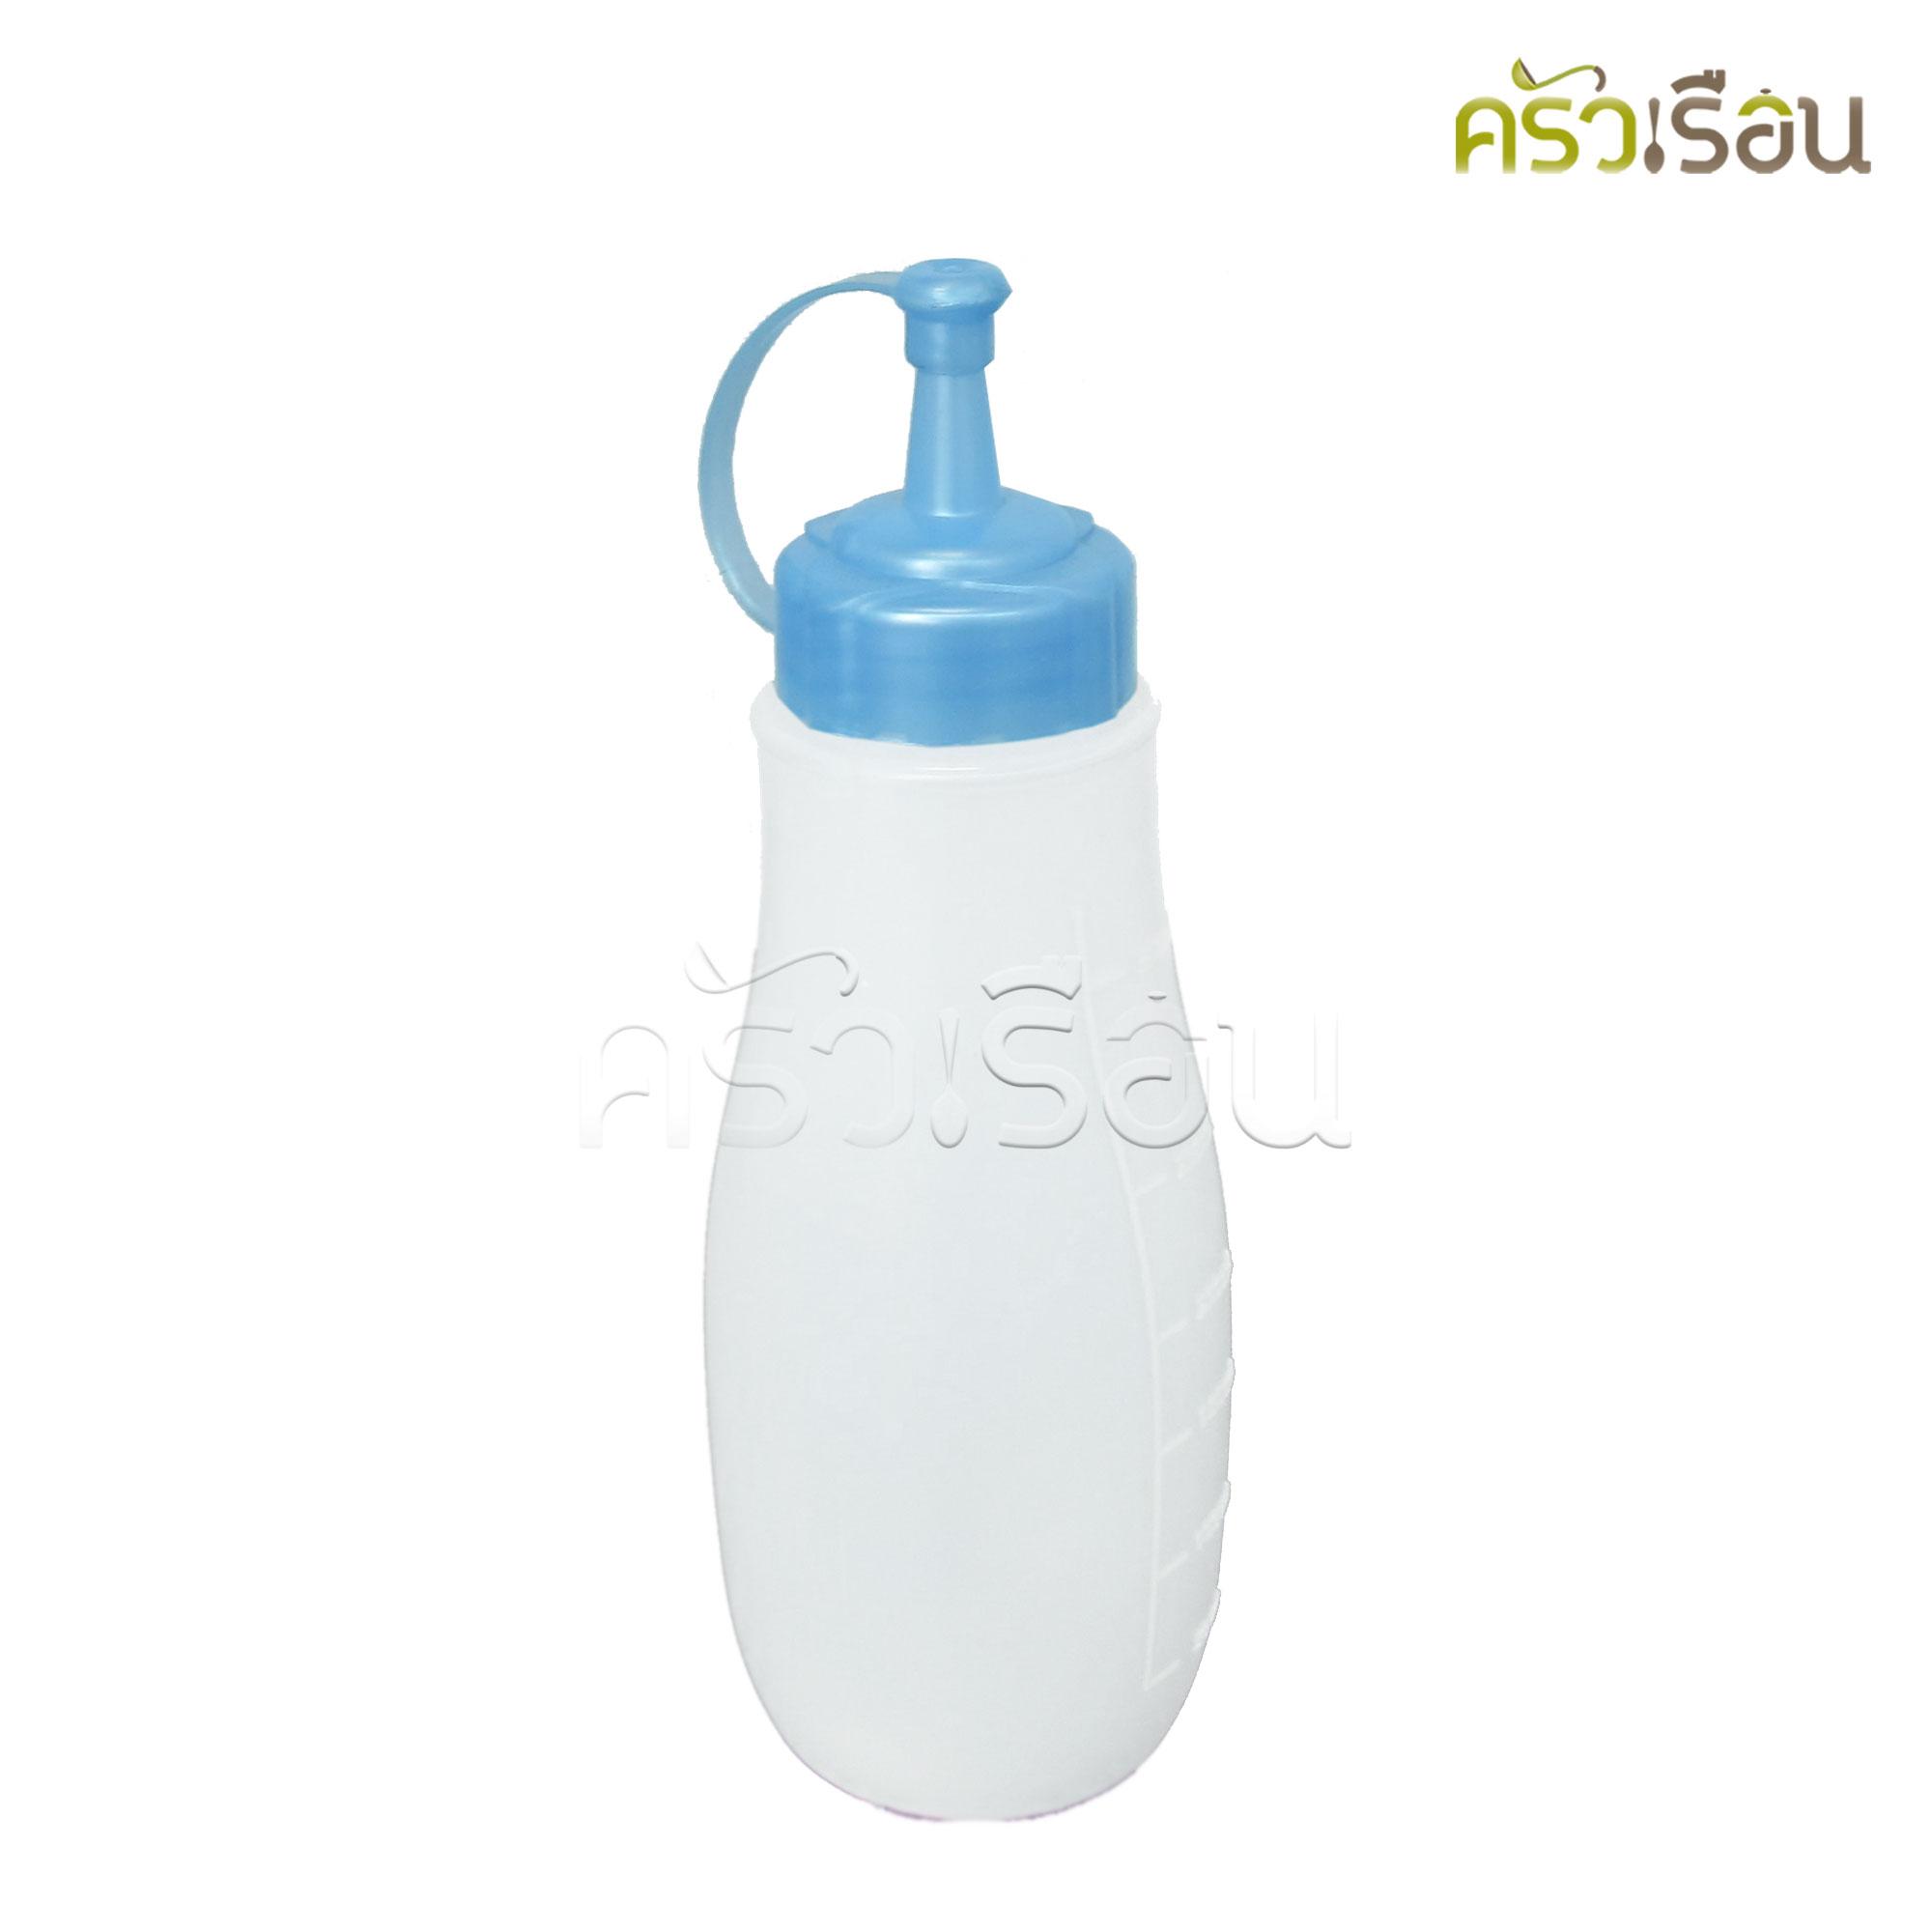 Reangwa Standard - ขวดซอสพลาสติก ฟ้า 350 ml. 9052